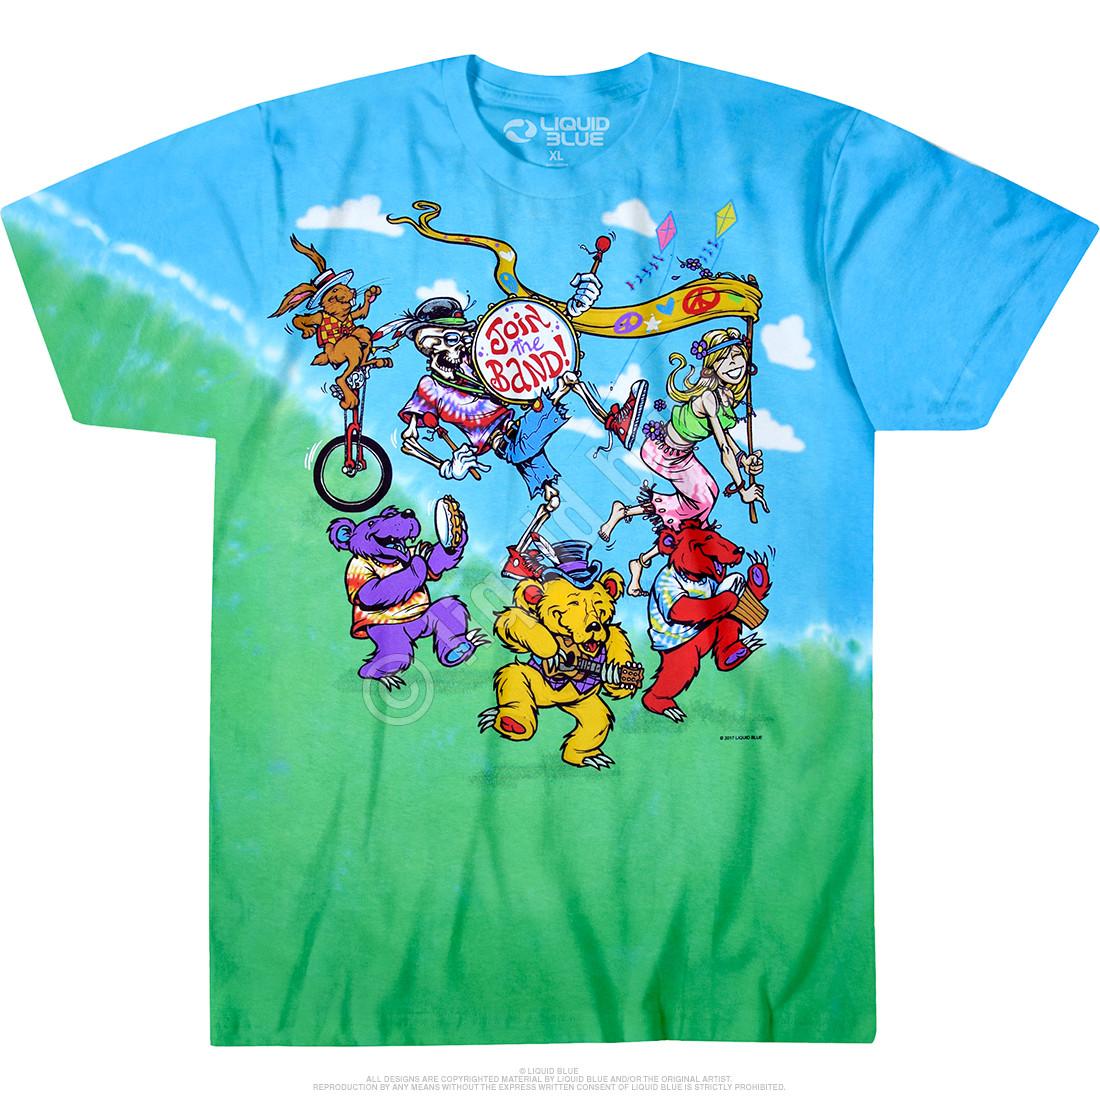 New GRATEFUL DEAD Taxi New York City Tie Dye T Shirt